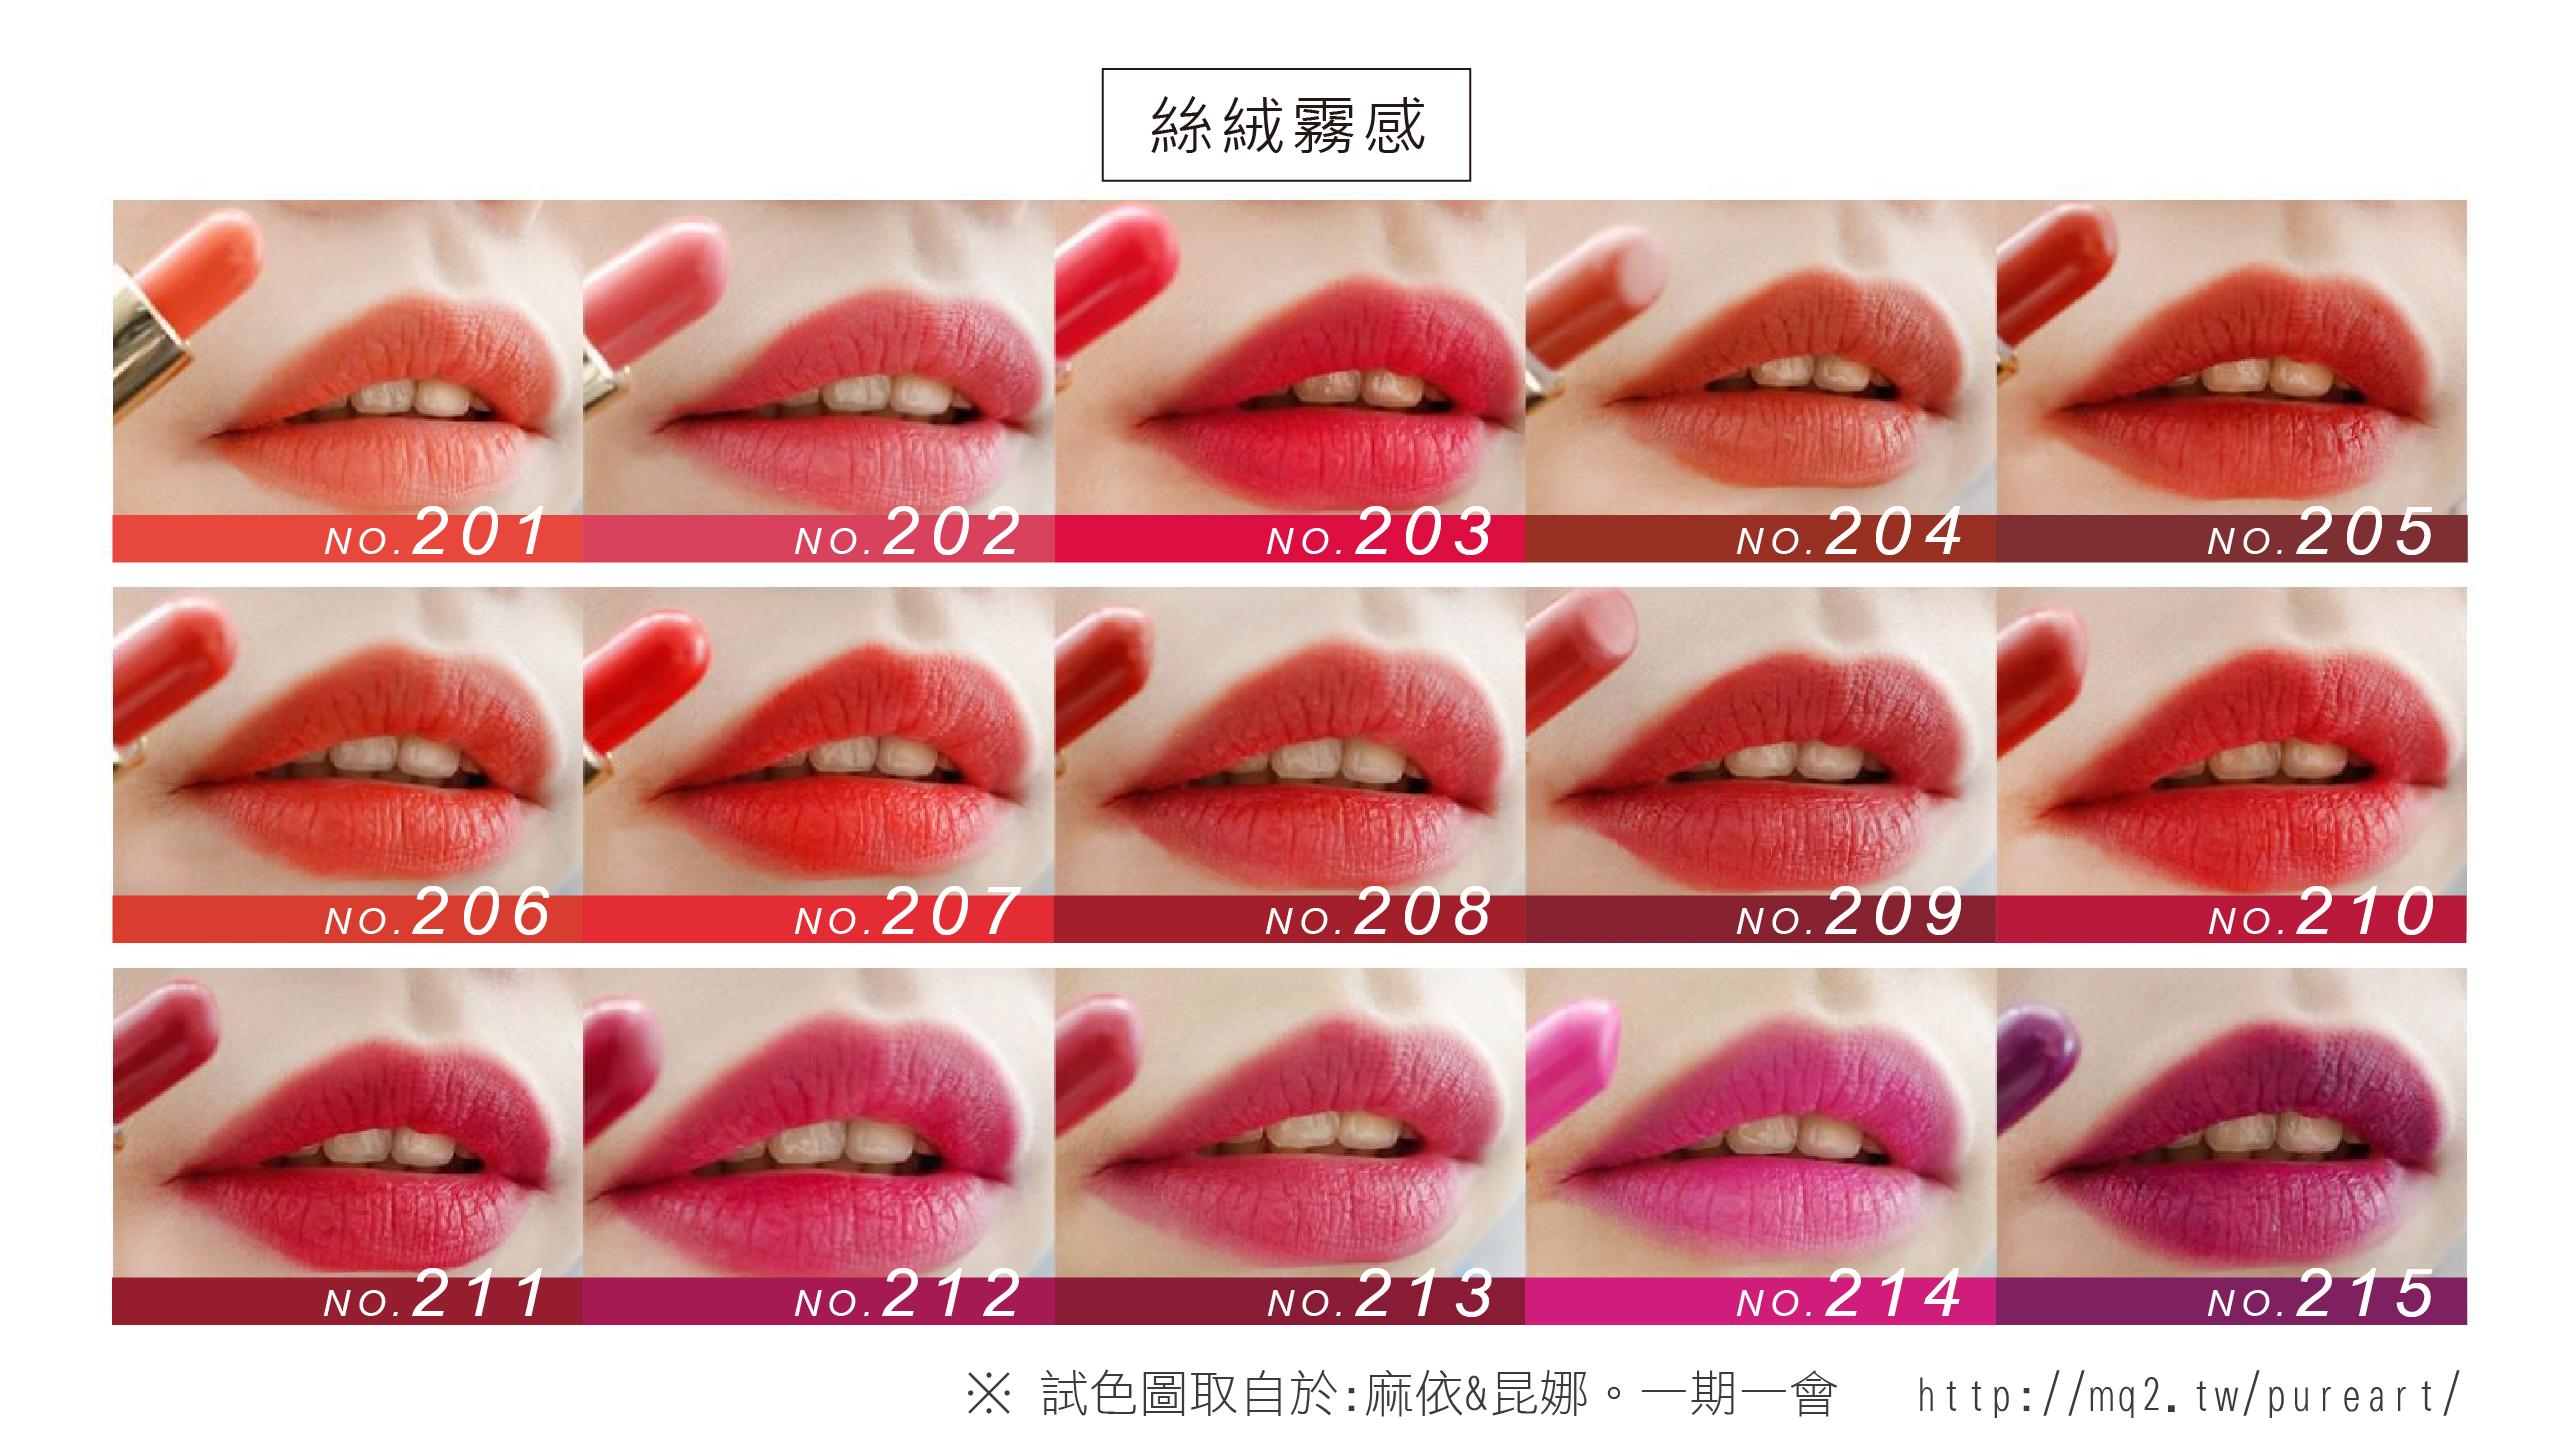 PureArt, 不色限迷你唇膏, PureArt唇膏, 迷你唇膏組, 唇膏推薦, 台灣彩妝, MIT彩妝, 台灣美妝, MIT美妝, 台灣品牌, 試用, 體驗